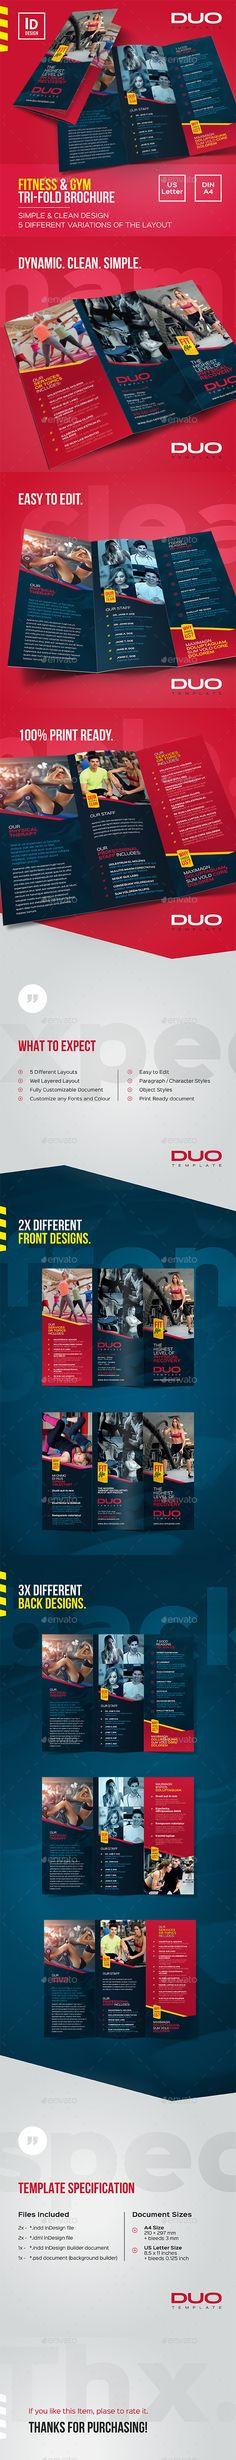 Fitness & Gym Trifold Brochure — InDesign INDD #sport #training • Download ➝ https://graphicriver.net/item/fitness-gym-trifold-brochure/20246586?ref=pxcr